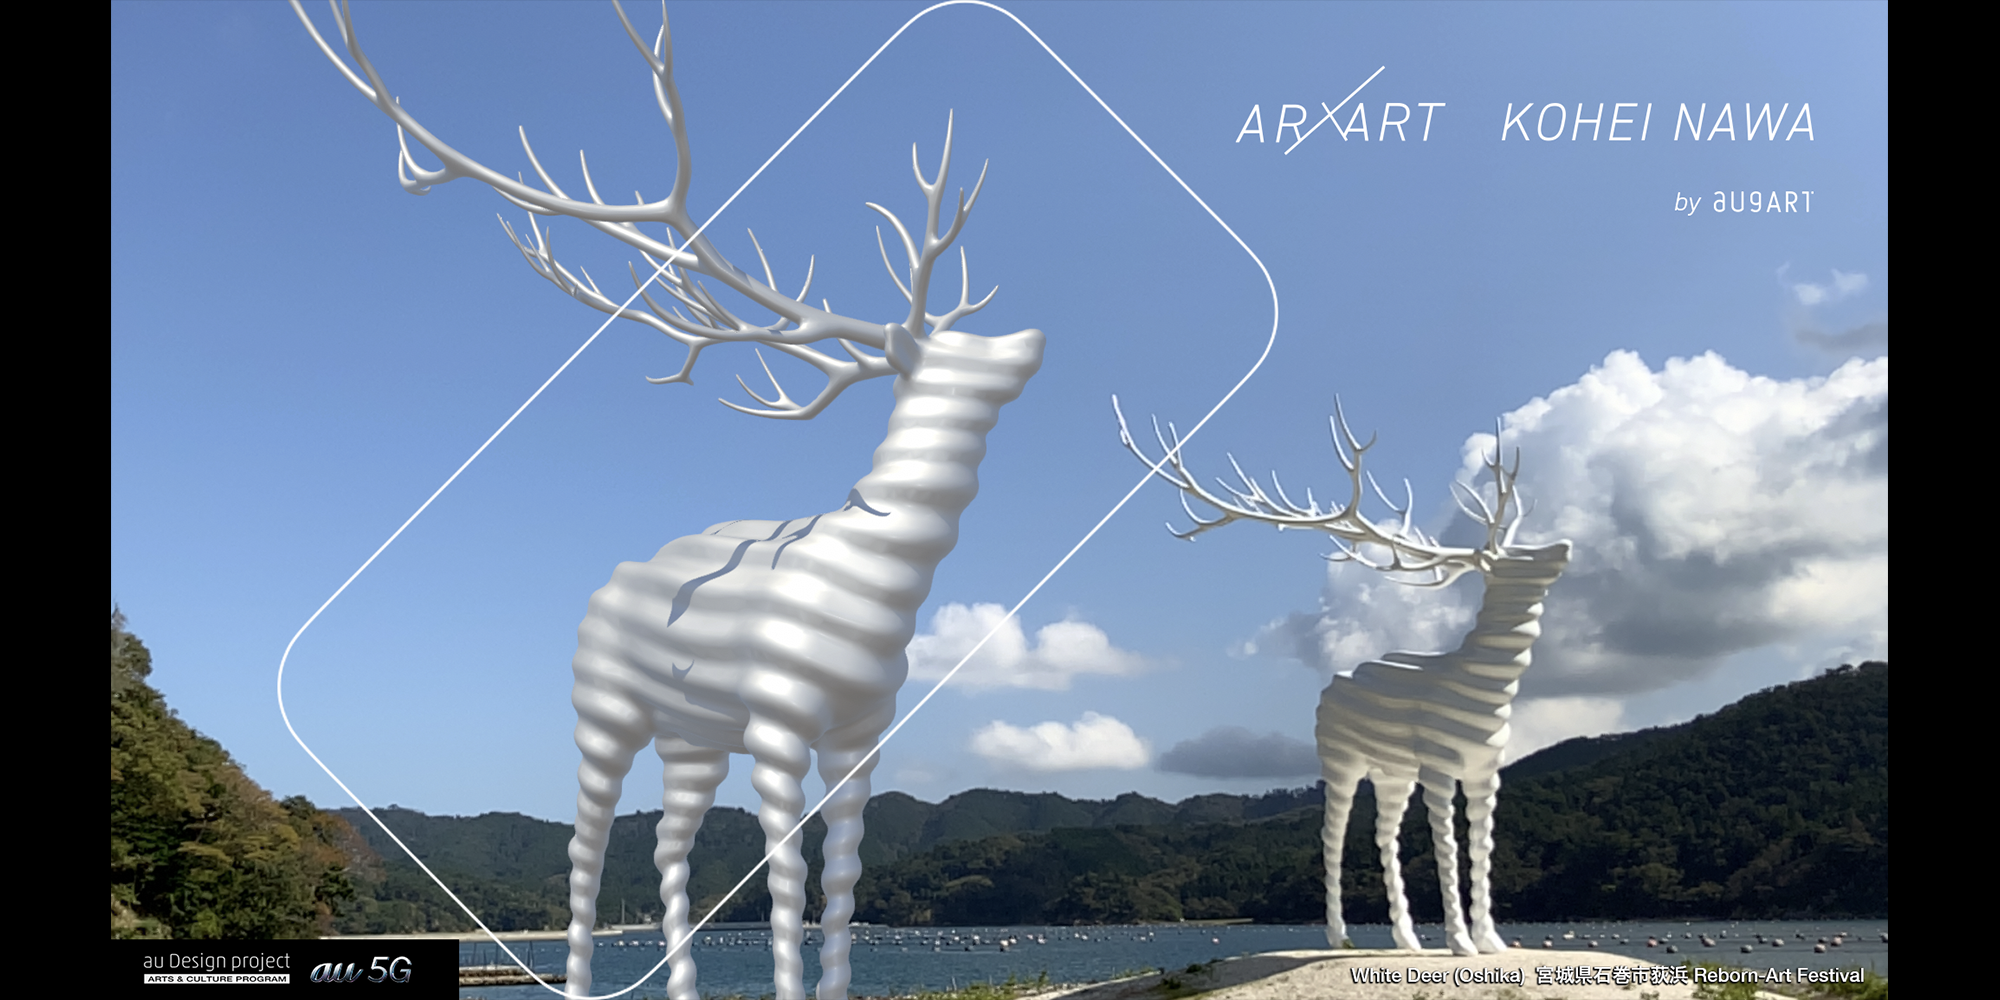 AR x ART KOHEI NAWA by augART